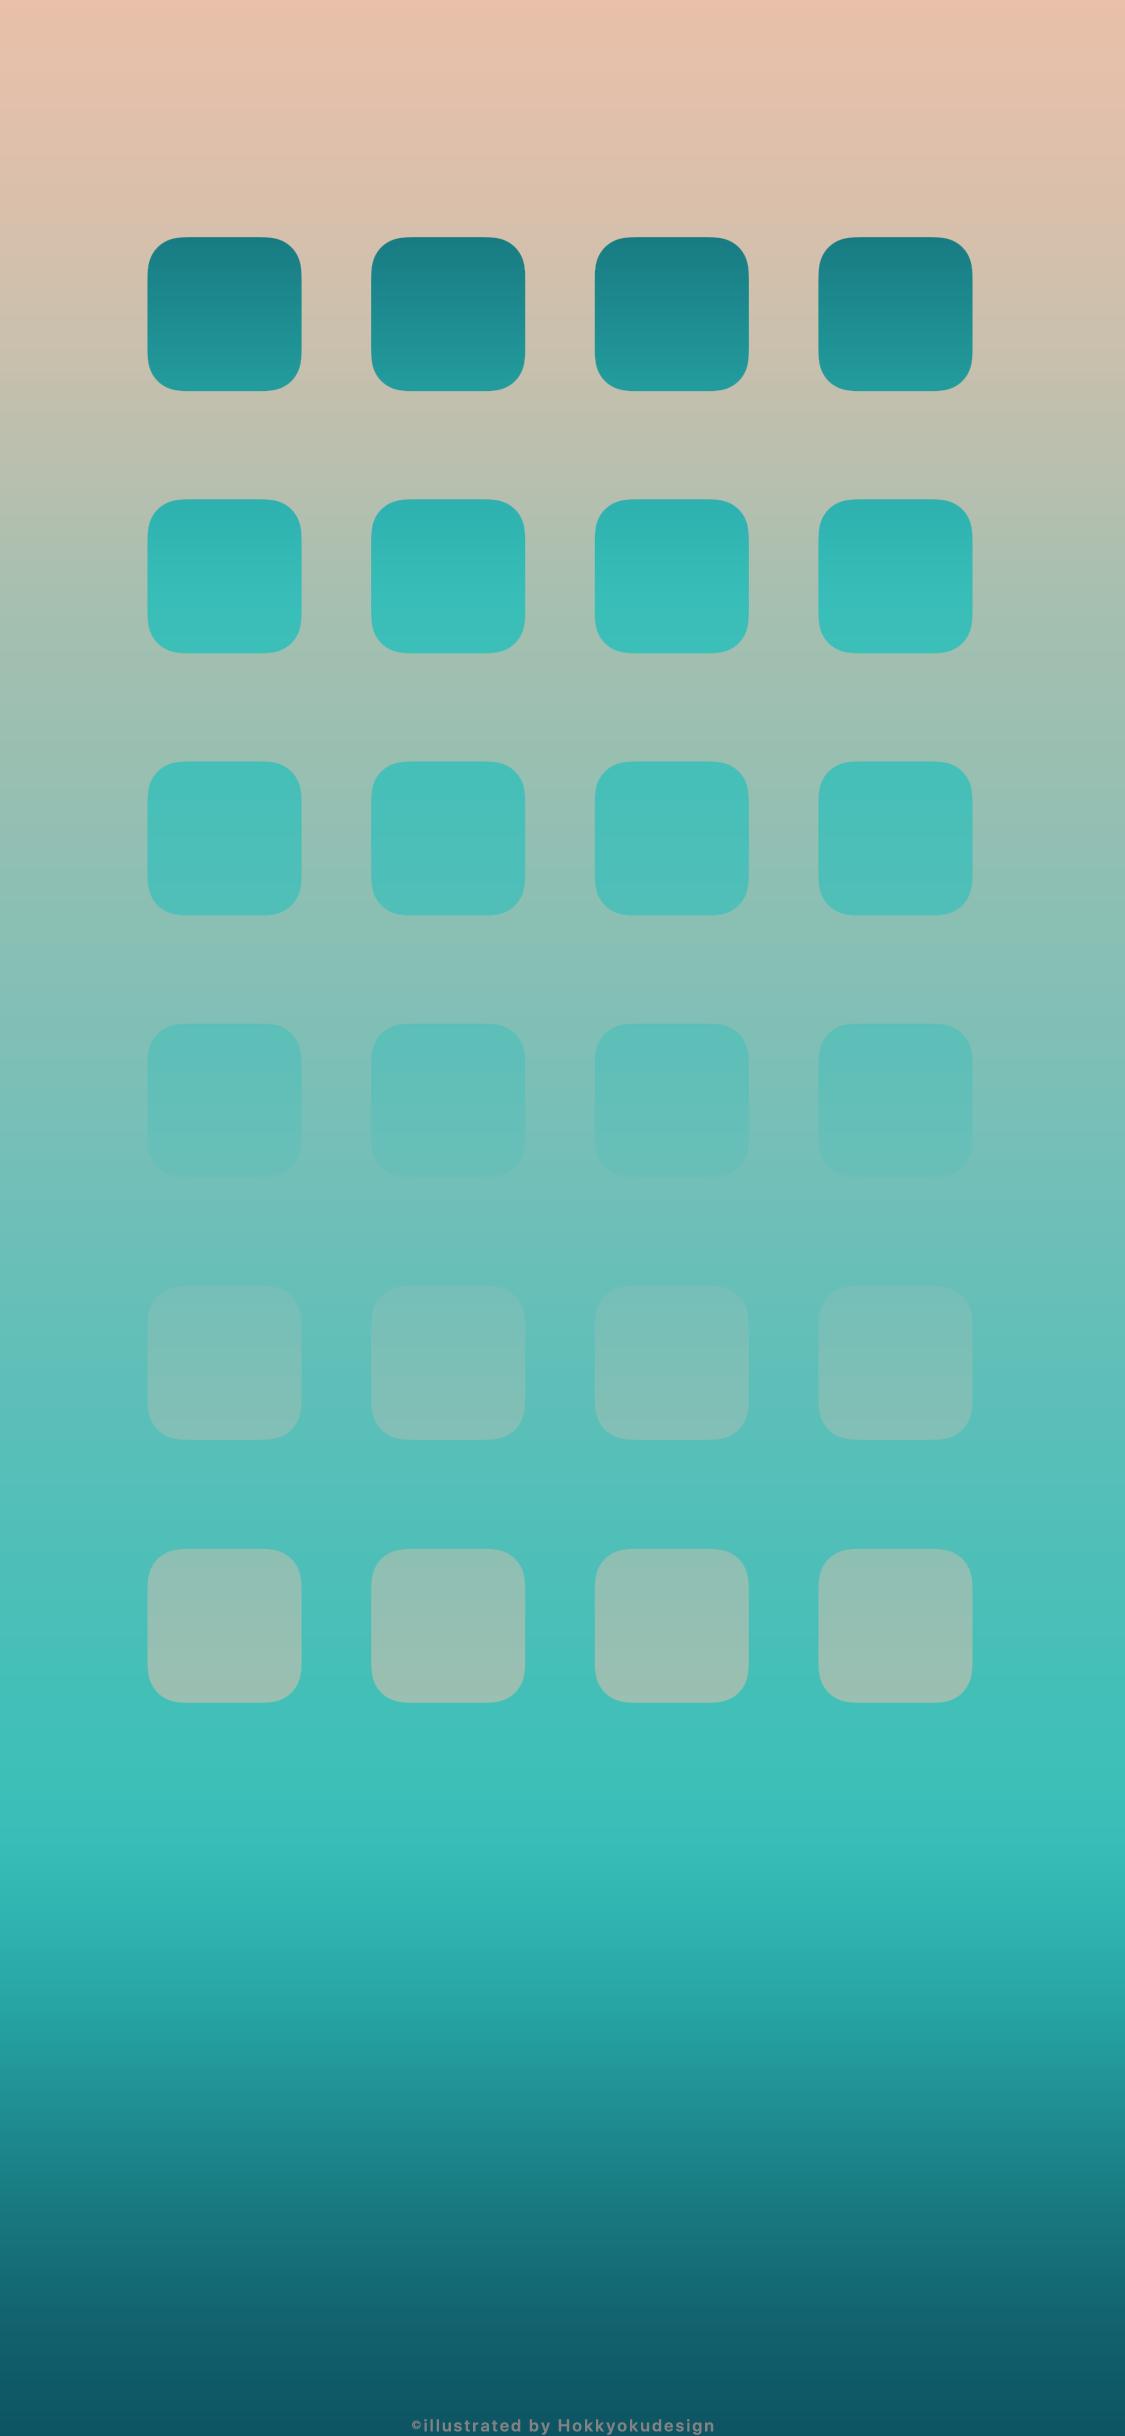 Iphonexの動く壁紙 Ios11ブルーグラデーション 壁紙 壁紙 本棚